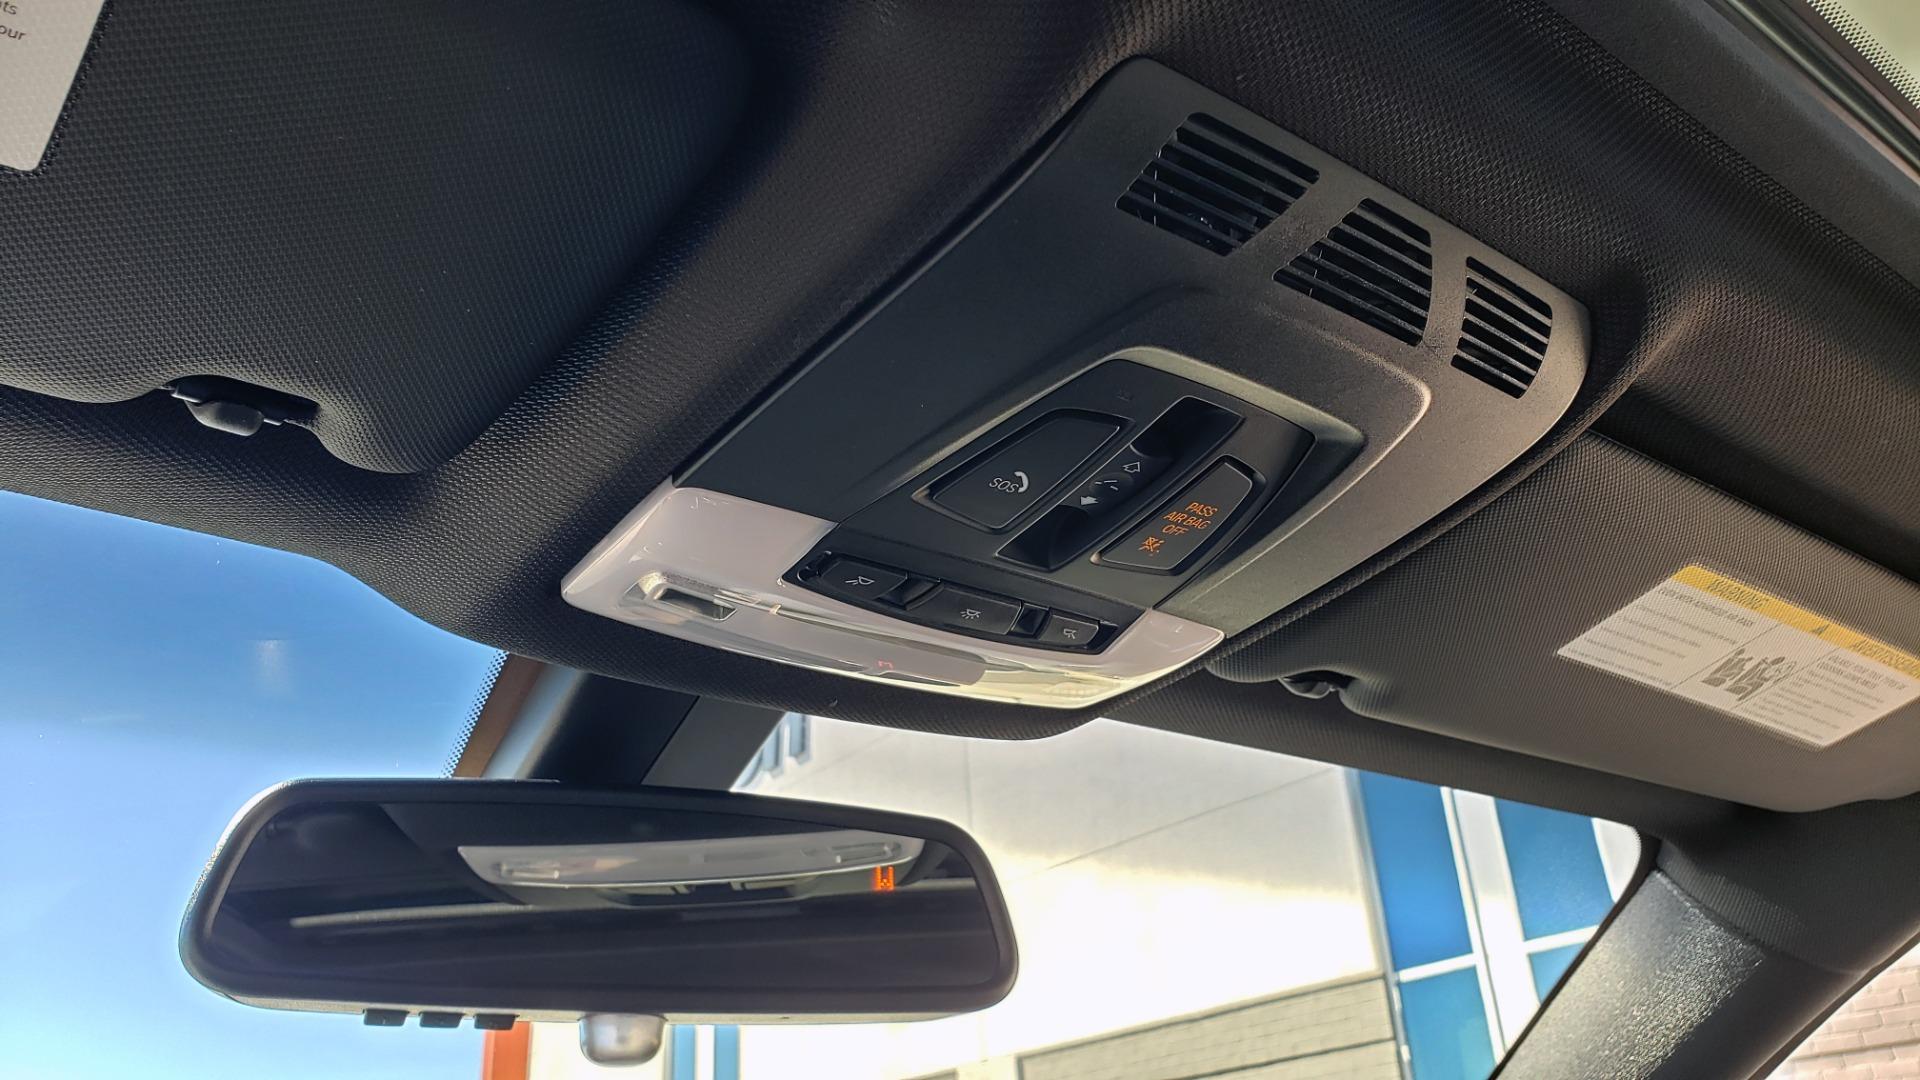 Used 2018 BMW 4 SERIES 430IXDRIVE / PREMIUM / NAV / SUNROOF / ESSENTIALS PKG for sale $28,995 at Formula Imports in Charlotte NC 28227 56